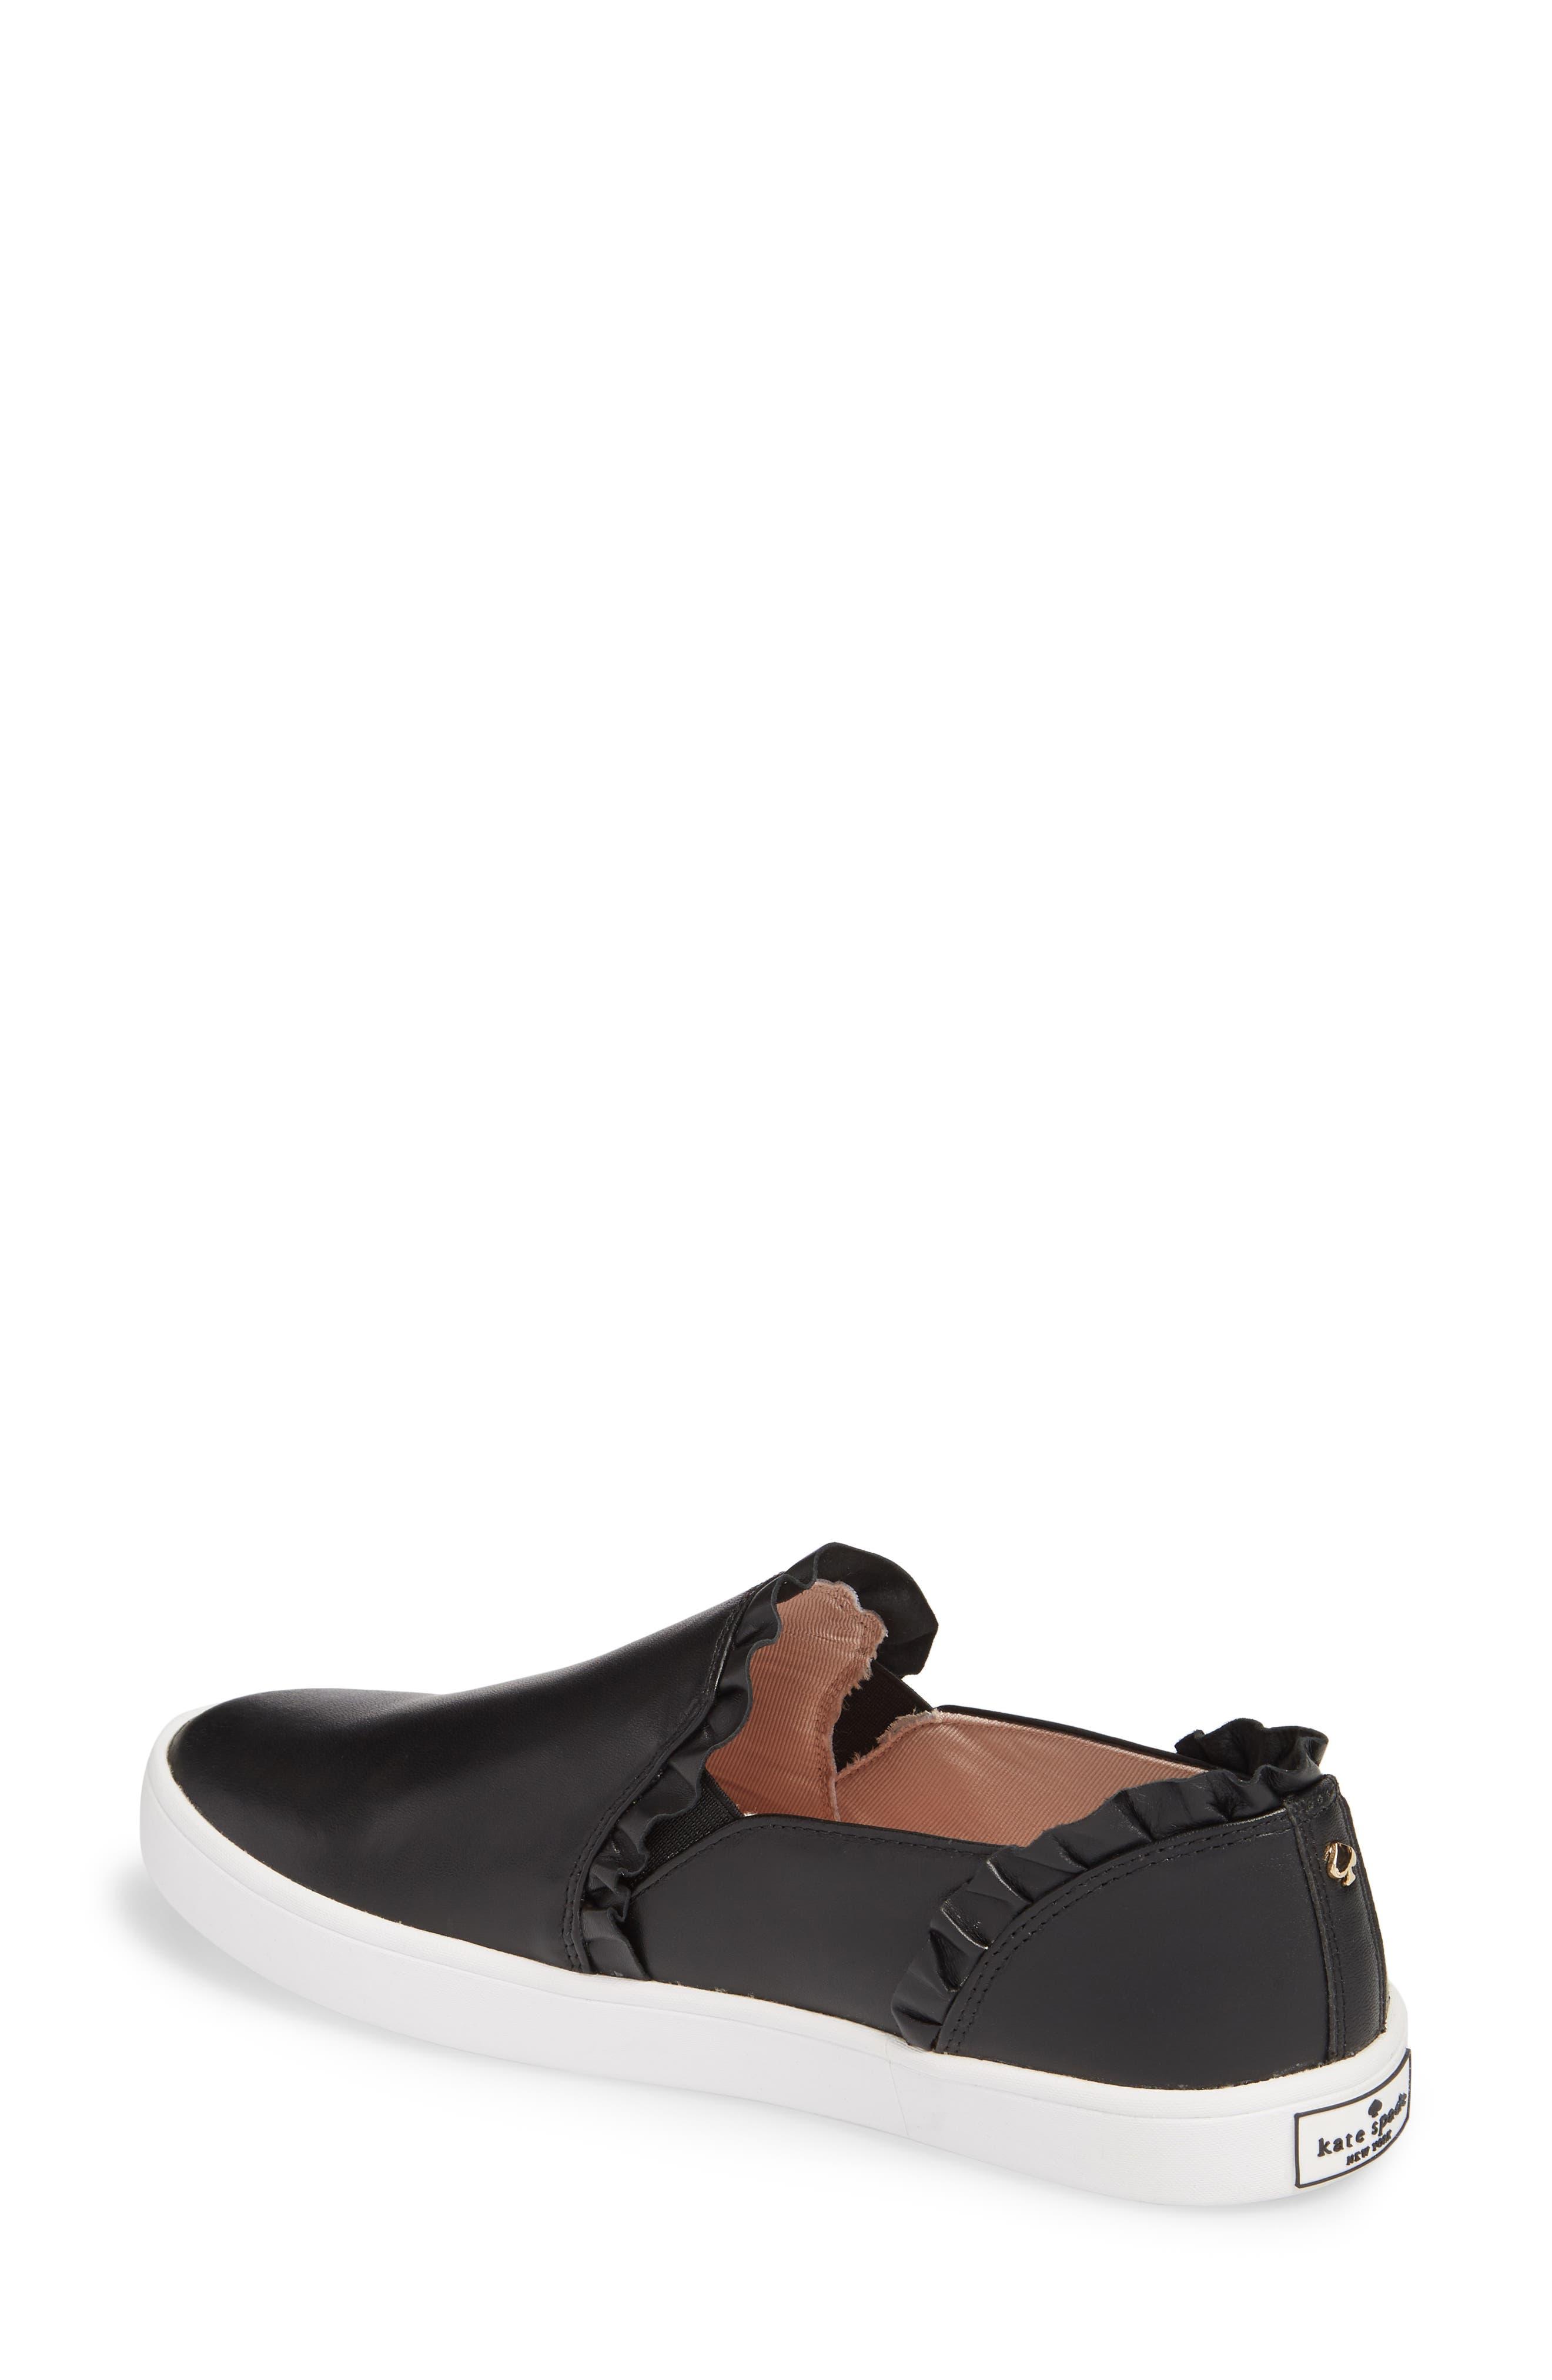 lilly ruffle slip-on sneaker,                             Alternate thumbnail 2, color,                             BLACK NAPPA